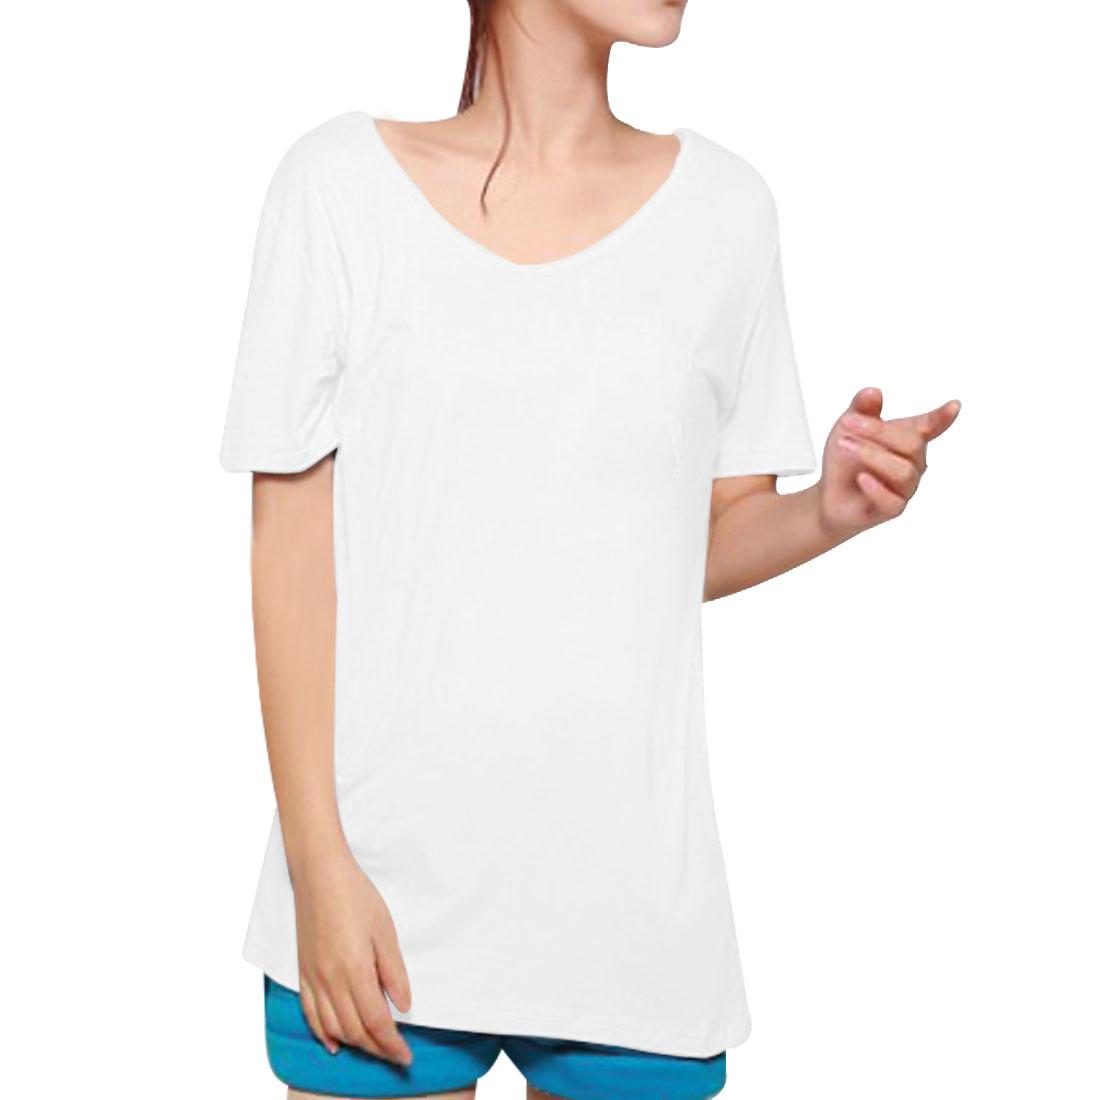 Ladies Summer Leisure V Neck Short Sleeve T-Shirt White XS